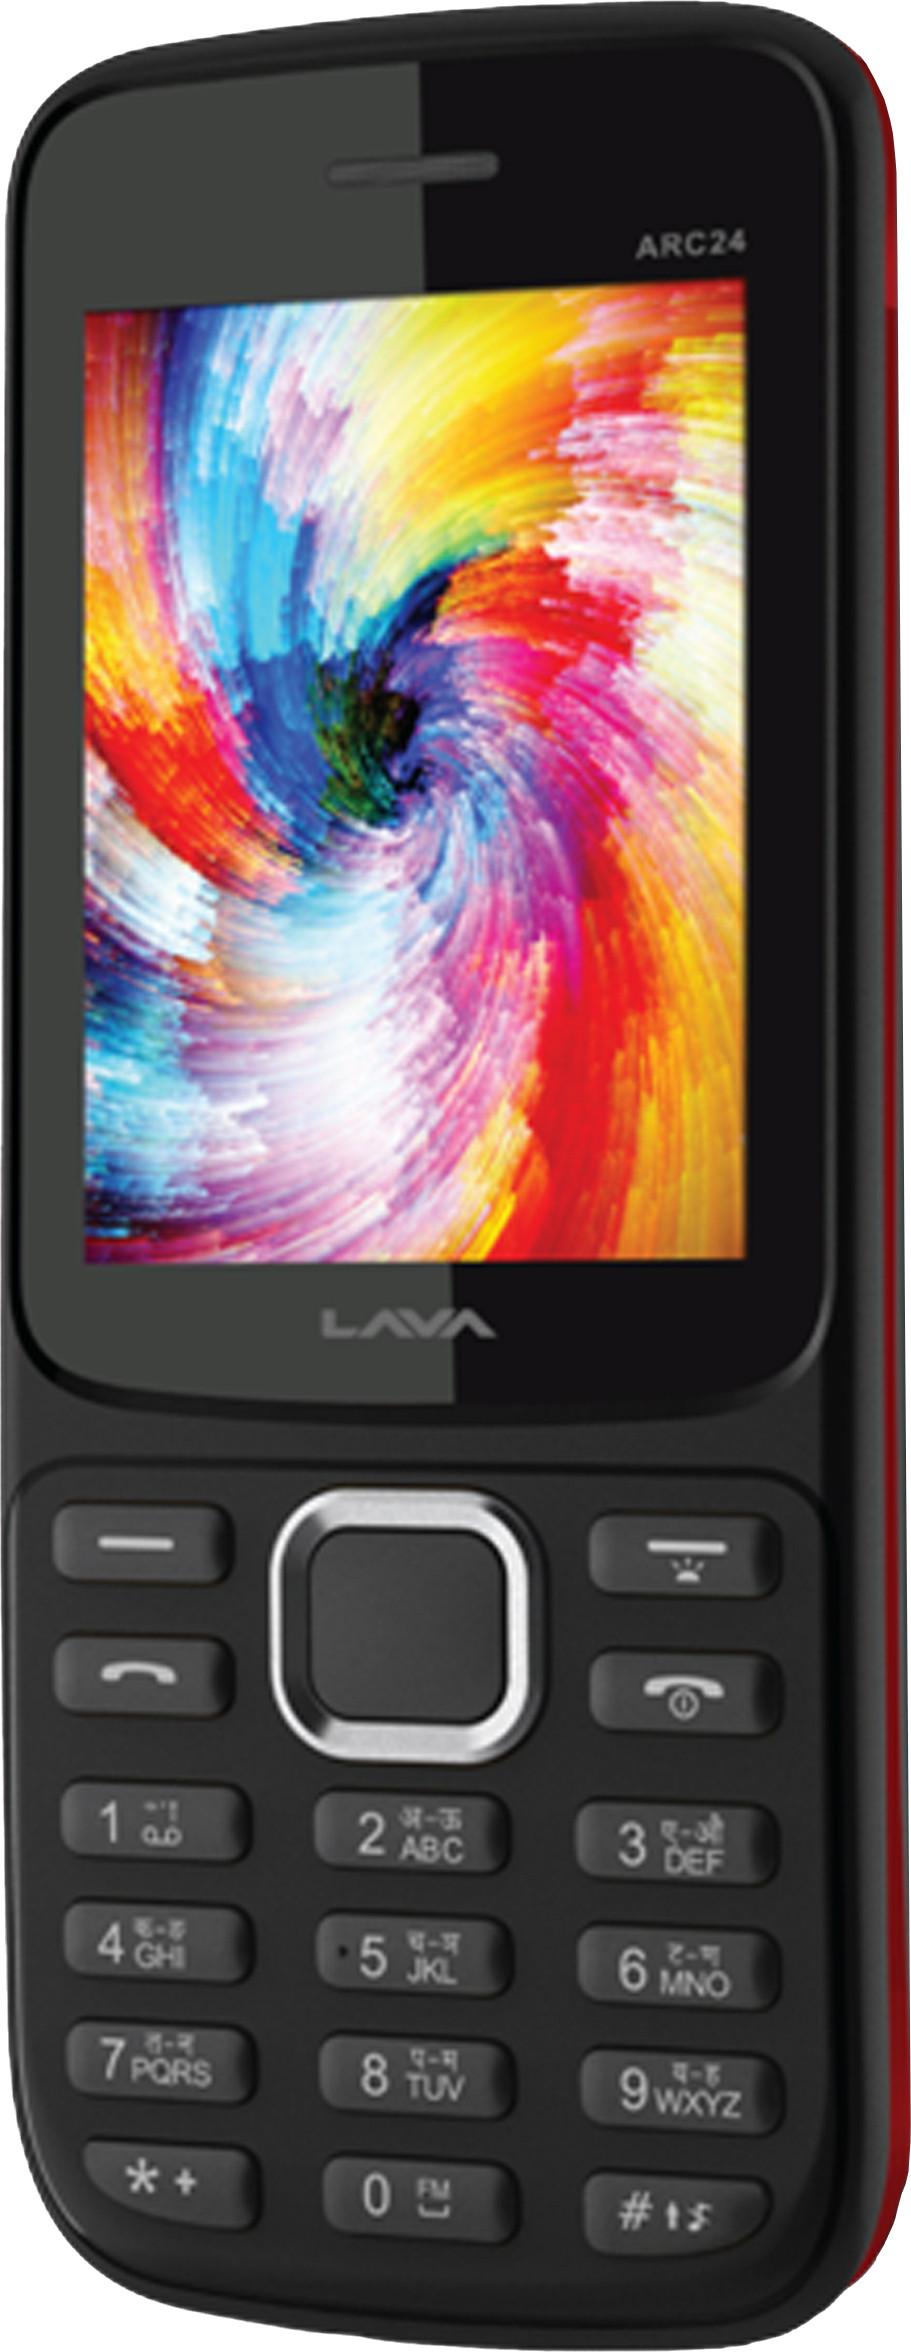 Lava ARC 24(Red)